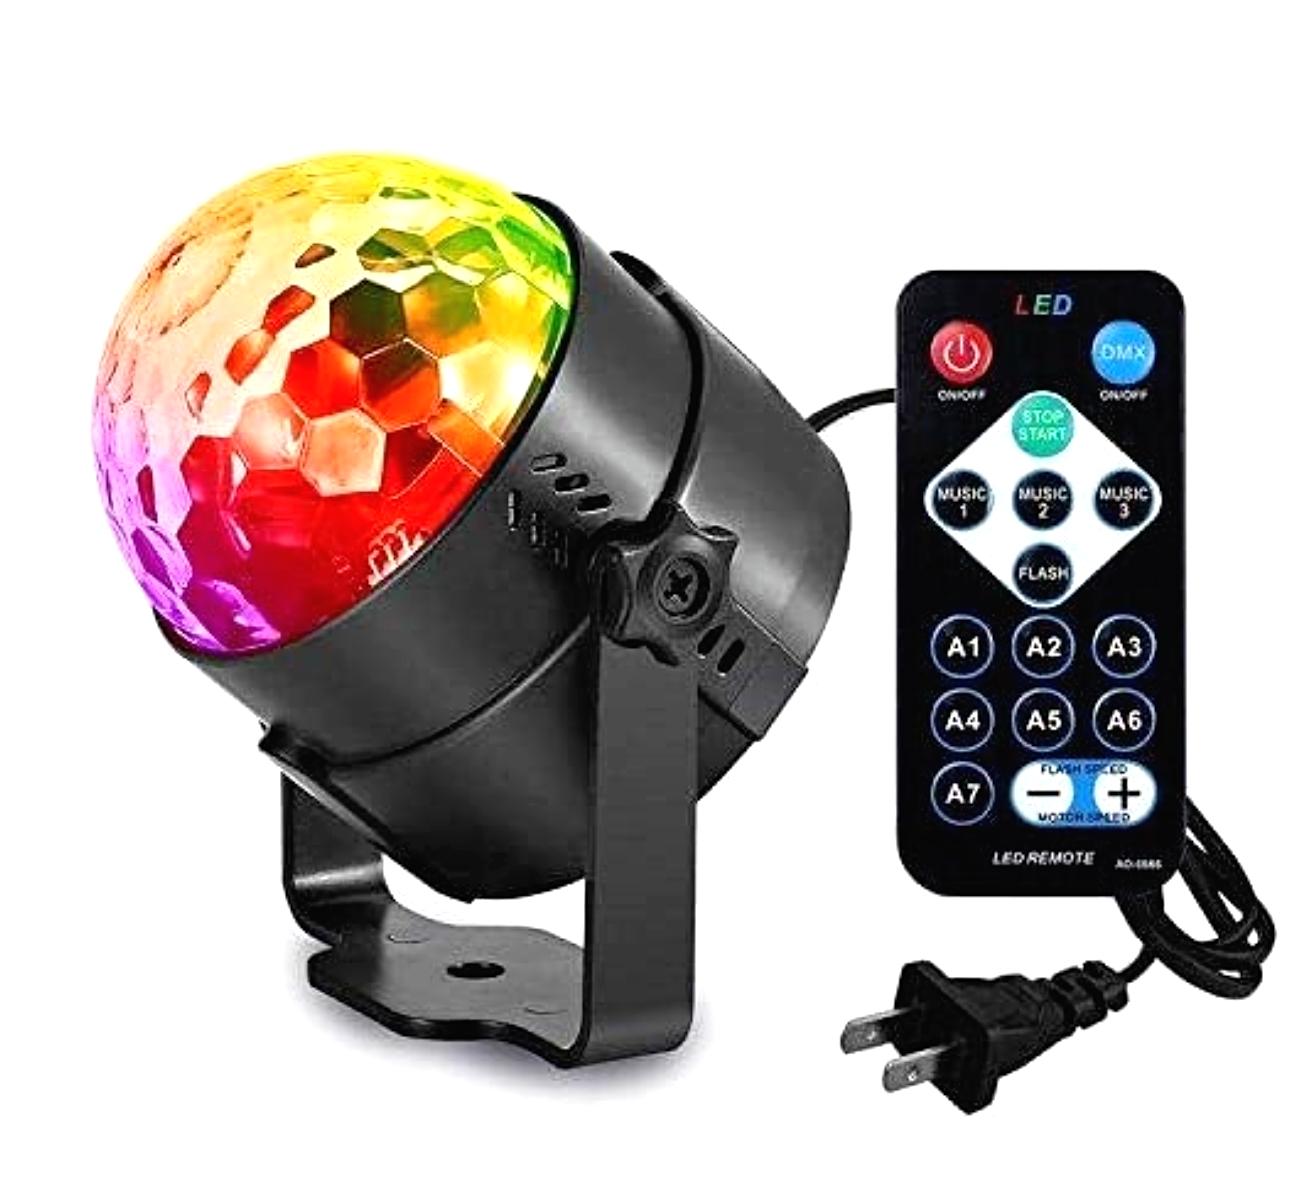 disco party lights strobe led dj ball